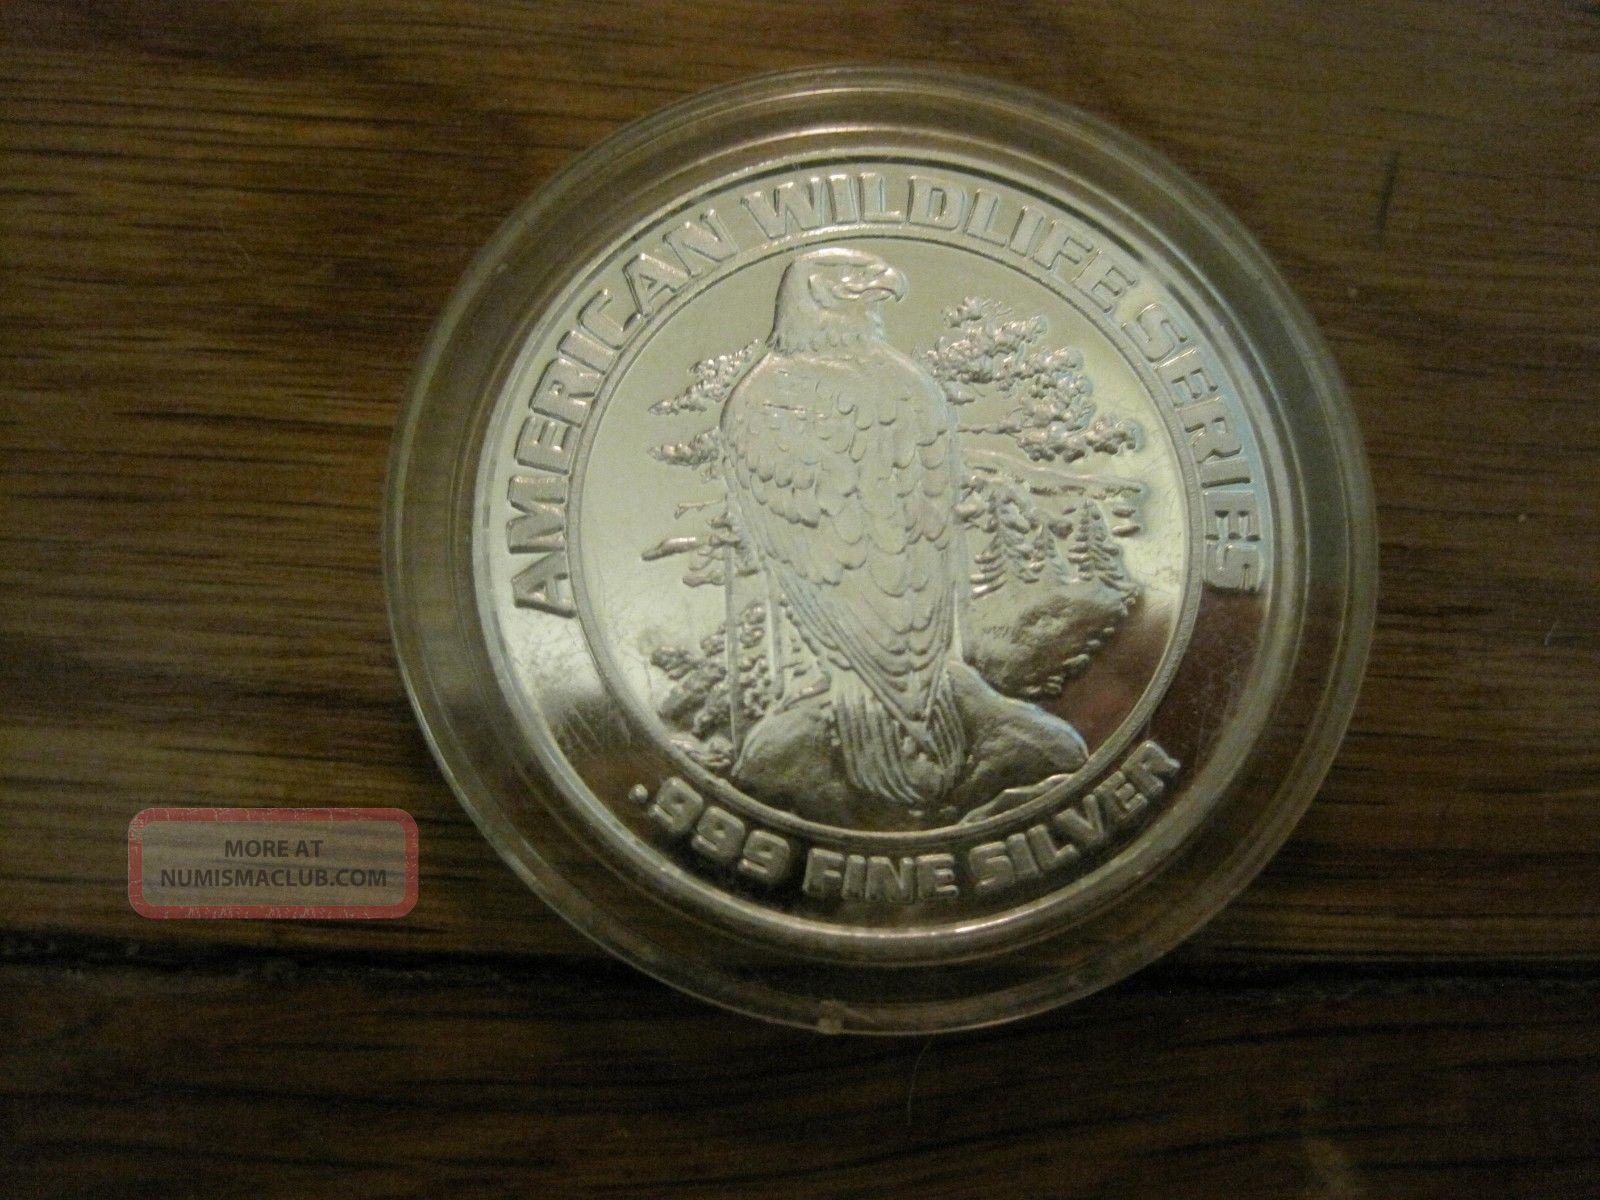 1993 Foxwoods Casino Strike Coin 999 Fine Silver